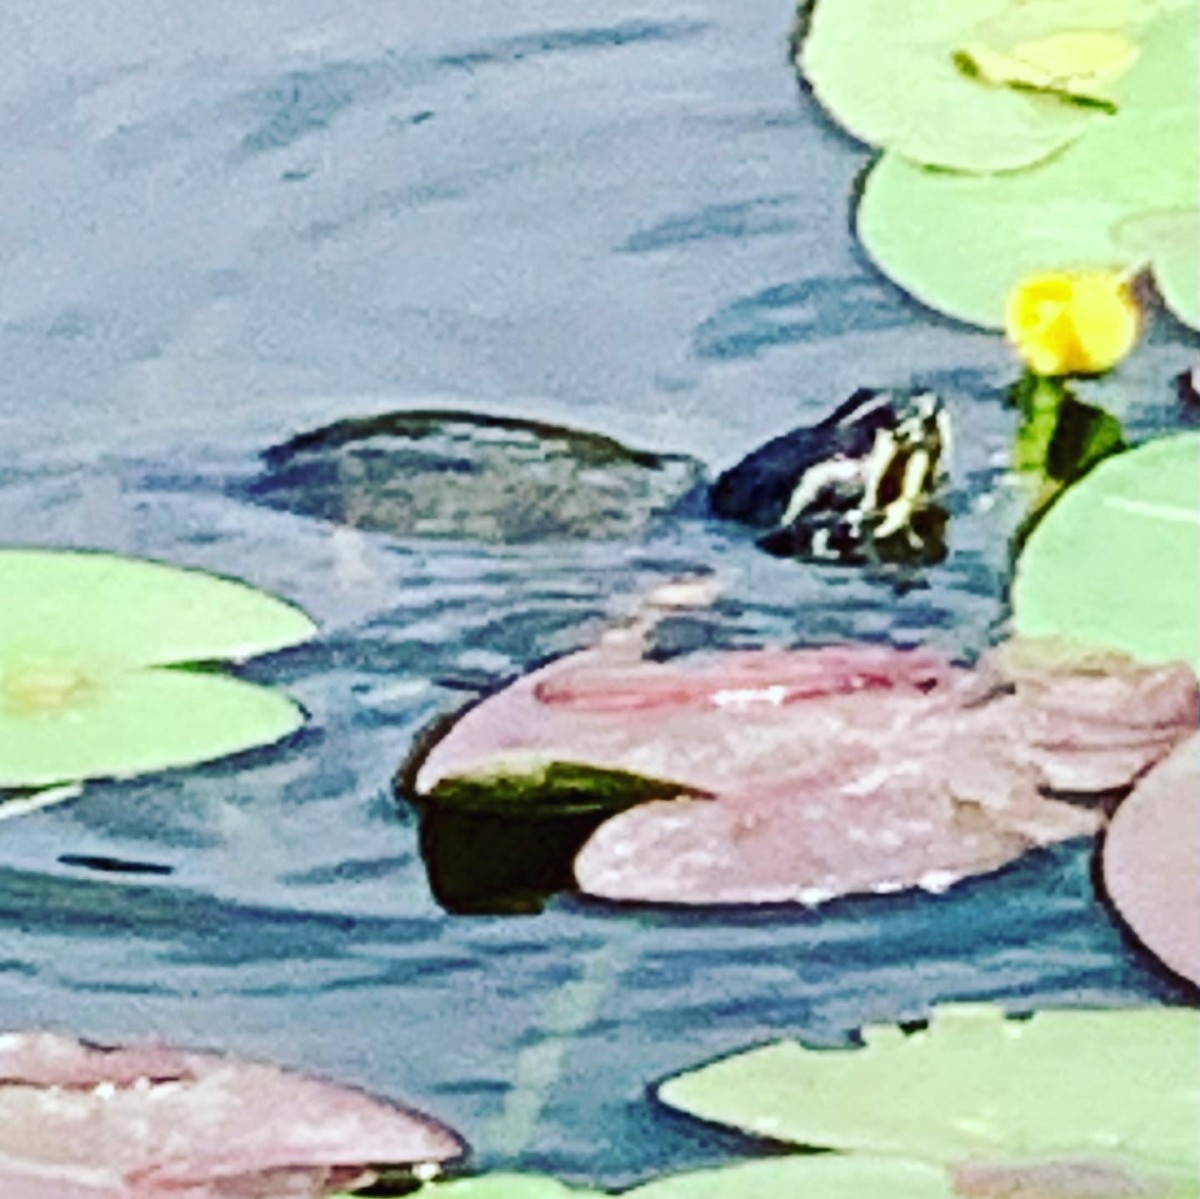 A turtle encounter